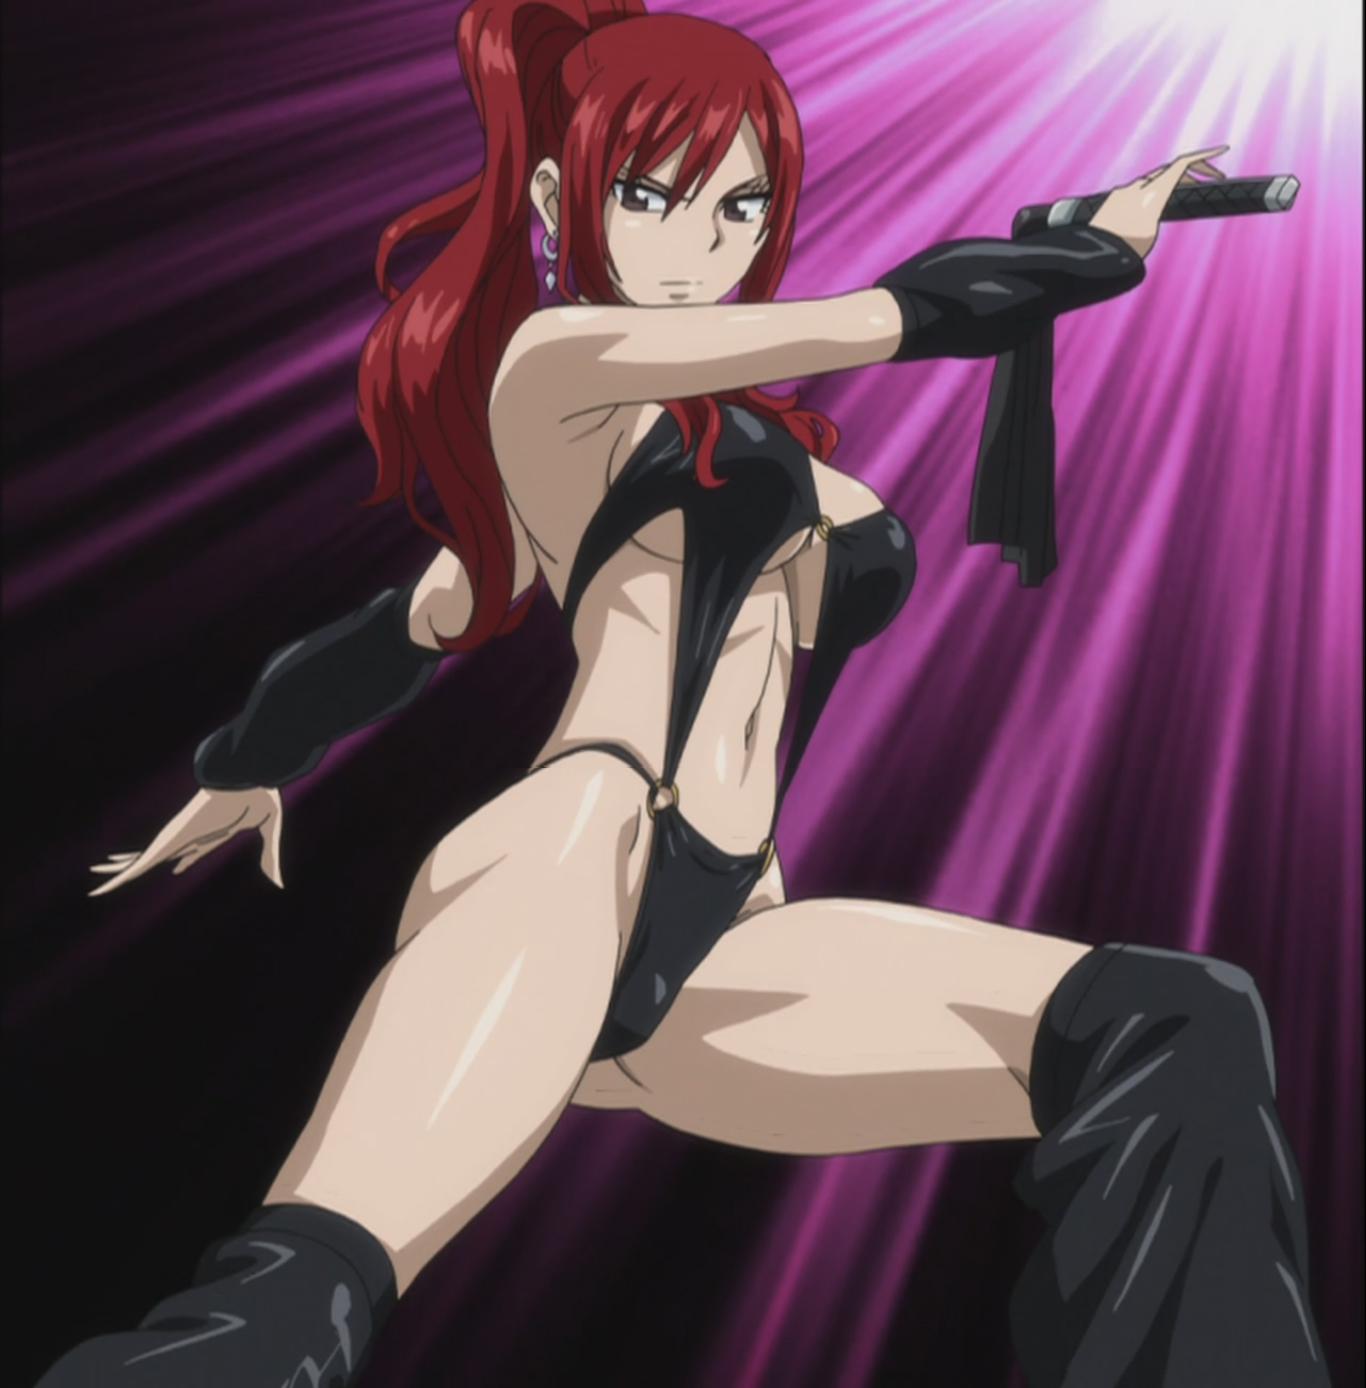 http://dailyanimeart.files.wordpress.com/2013/01/erza-scarlet-bondage-sexy.jpg